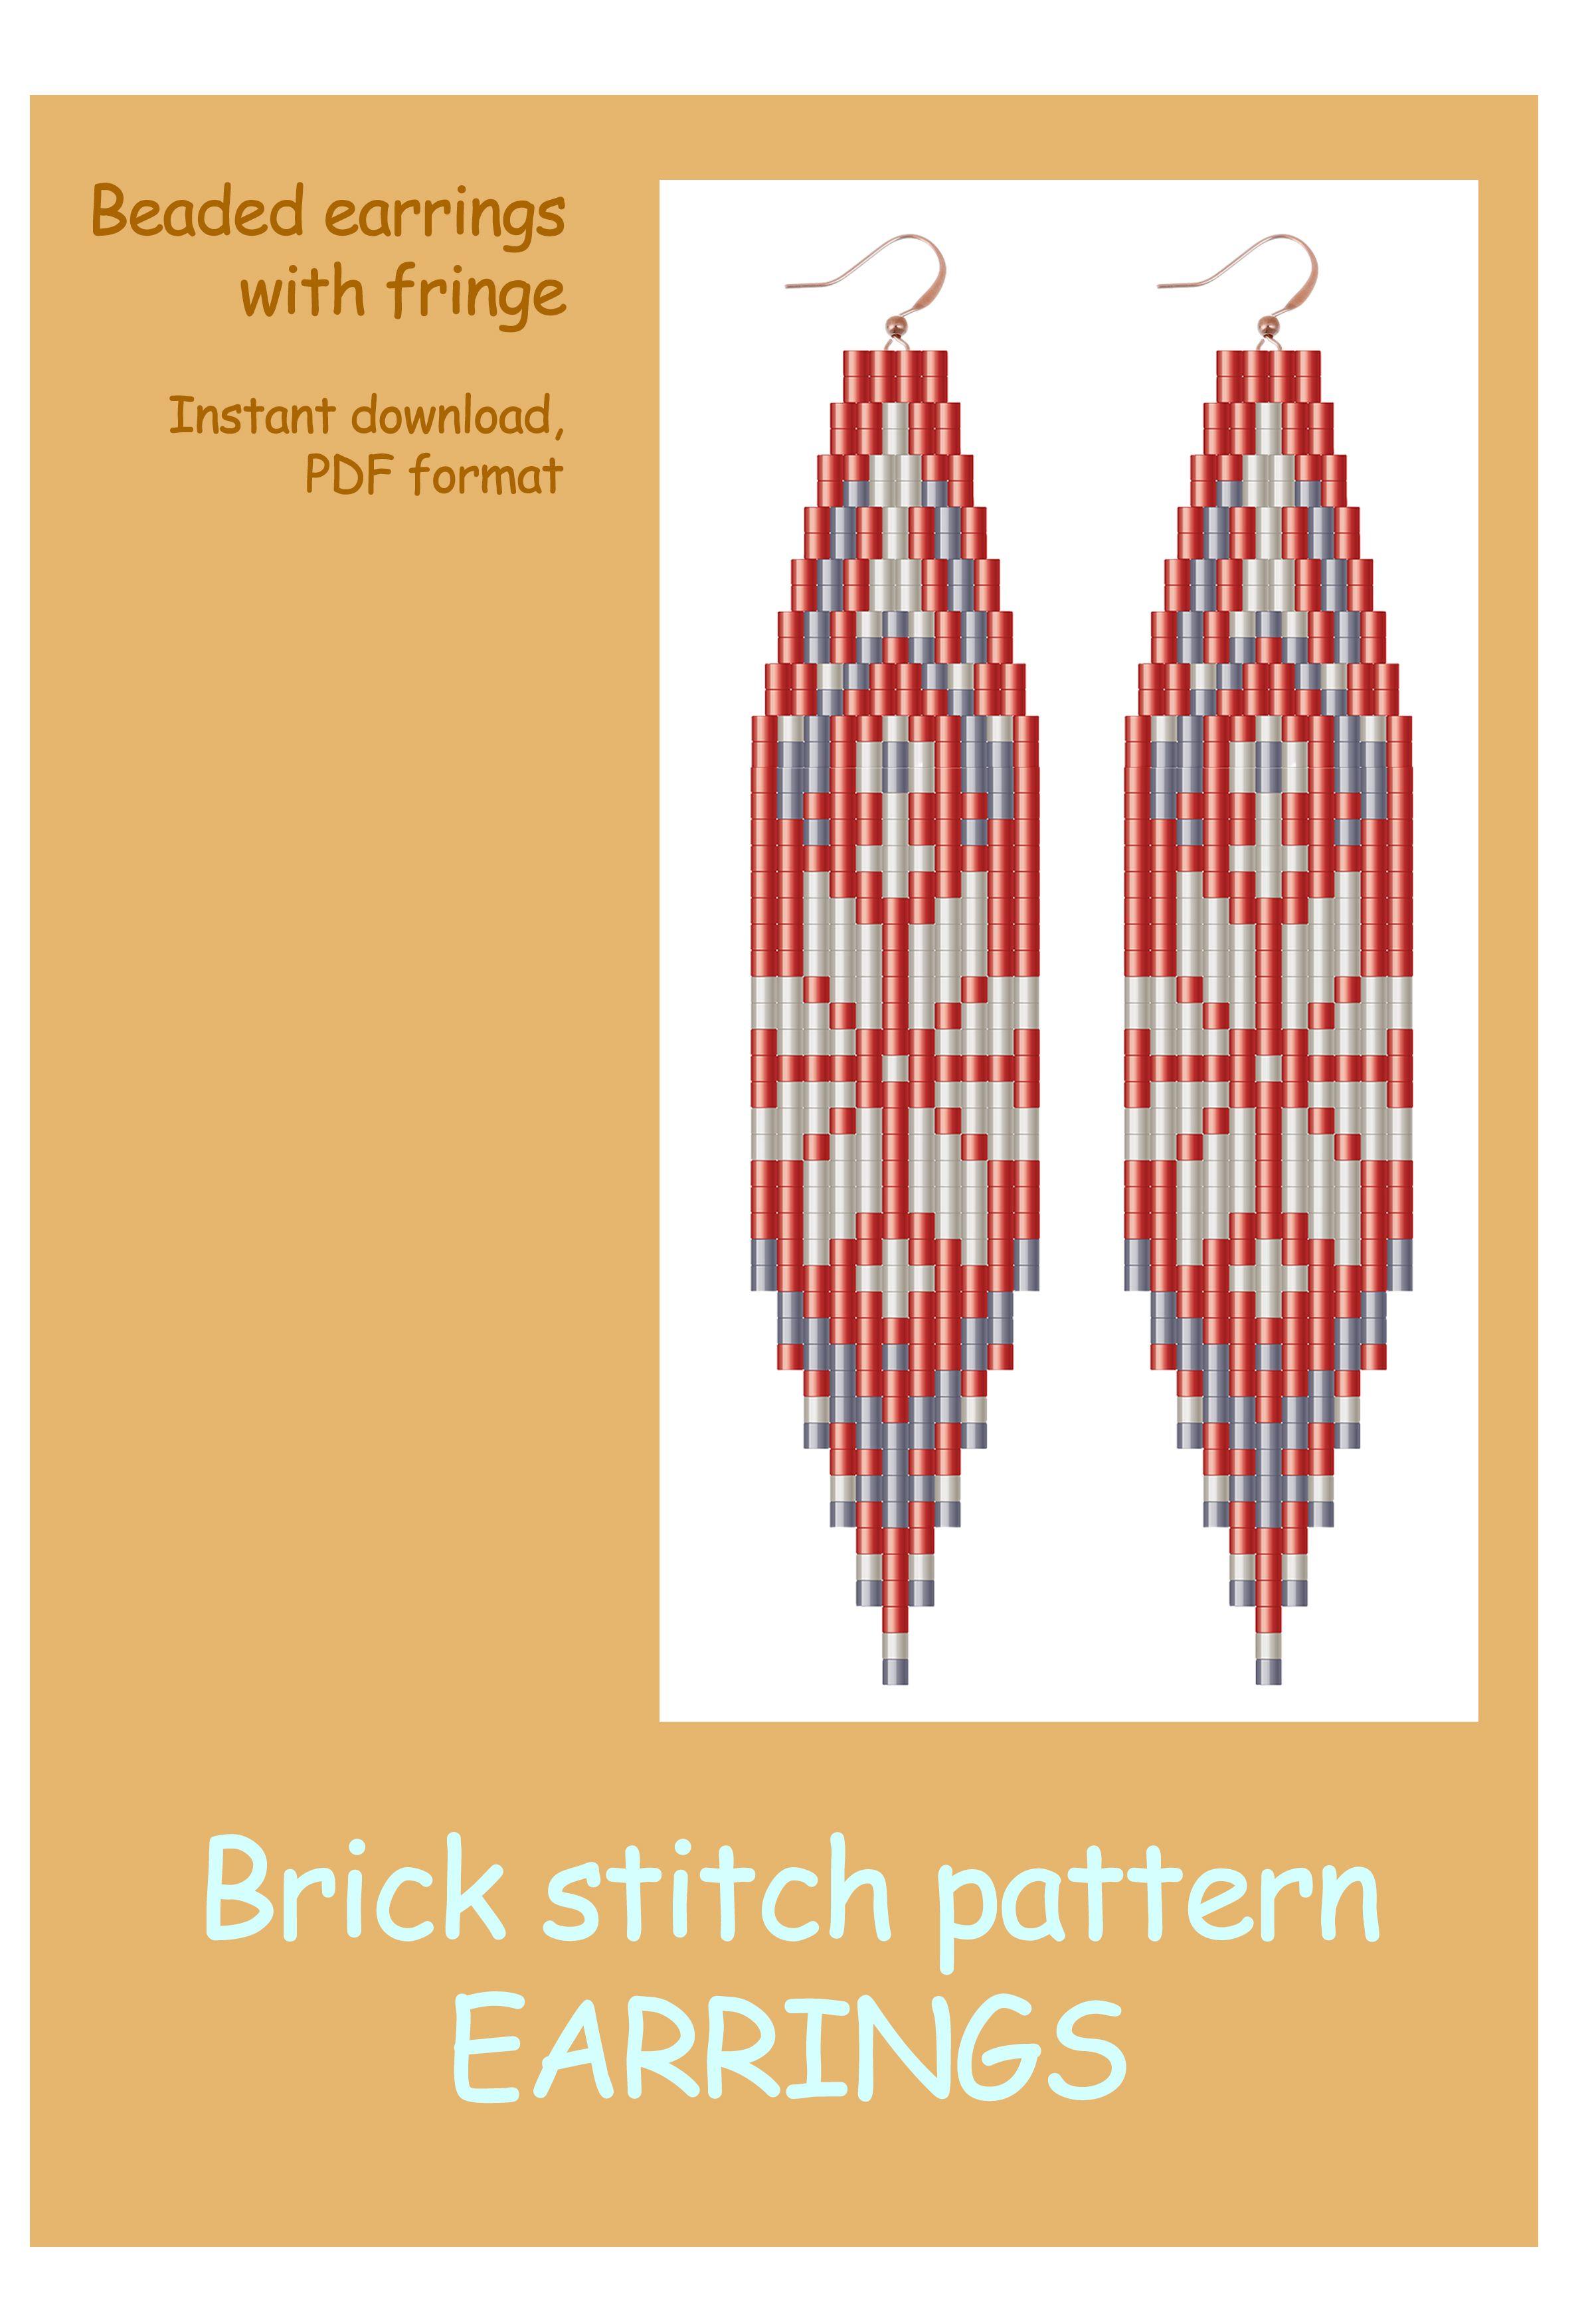 Brick Stitch Pattern Beaded Earrings With Fringe Snowflakes Print Earrings Diy Seed Bead Pattern Christmas Pattern Brick Stitch Pattern Brick Stitch Pattern Earring Earring Patterns